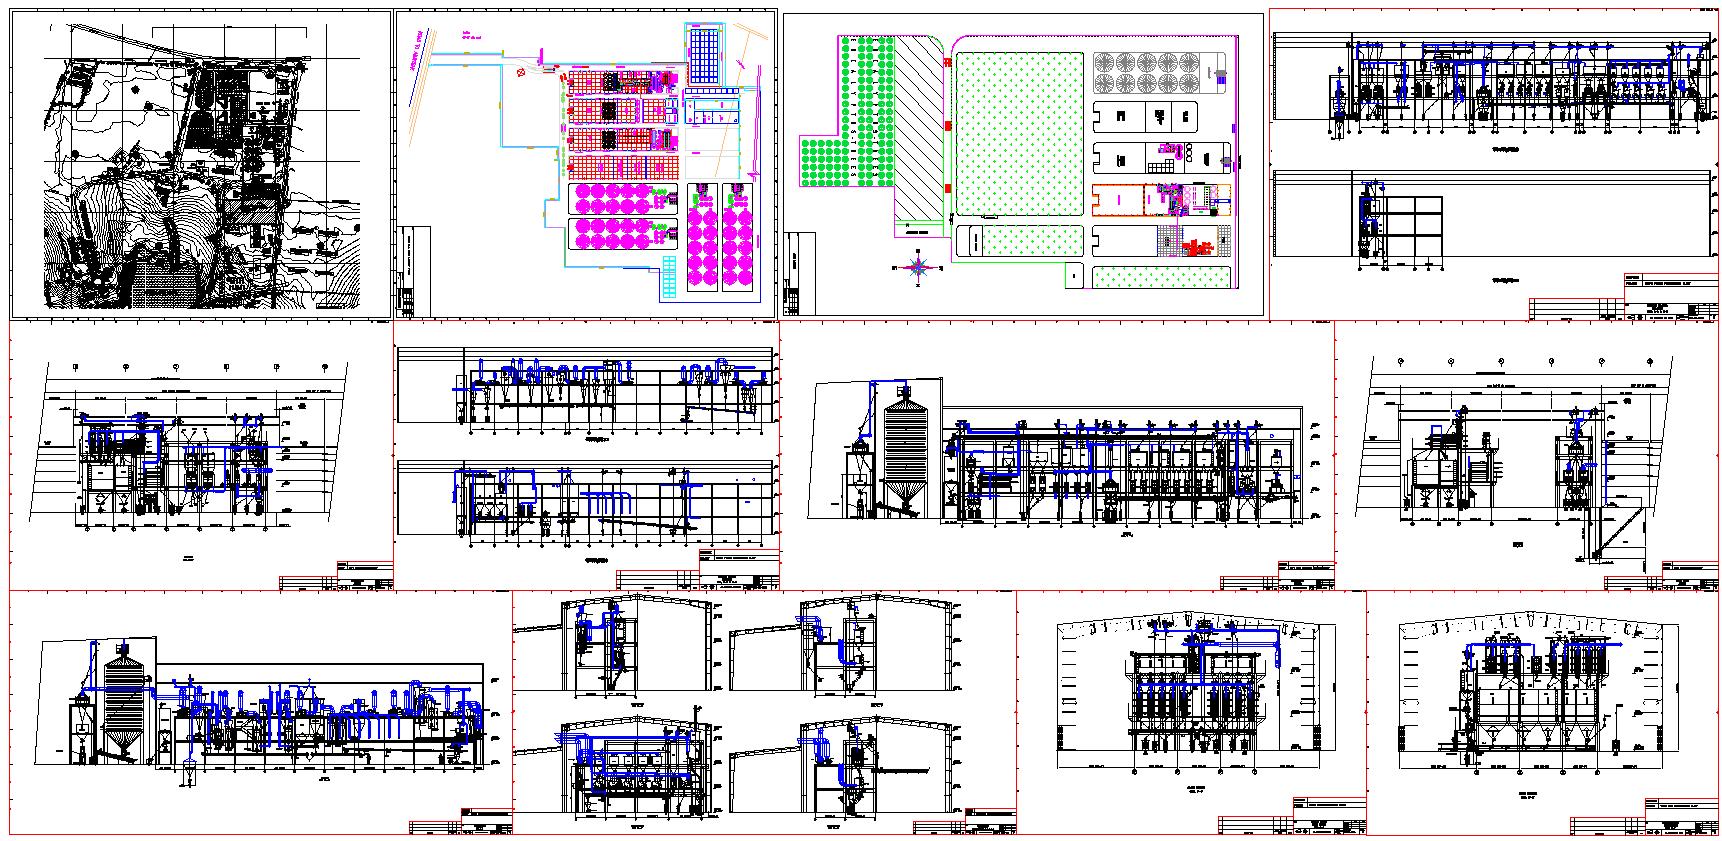 Grain mill plant designs [DWG, PDF]